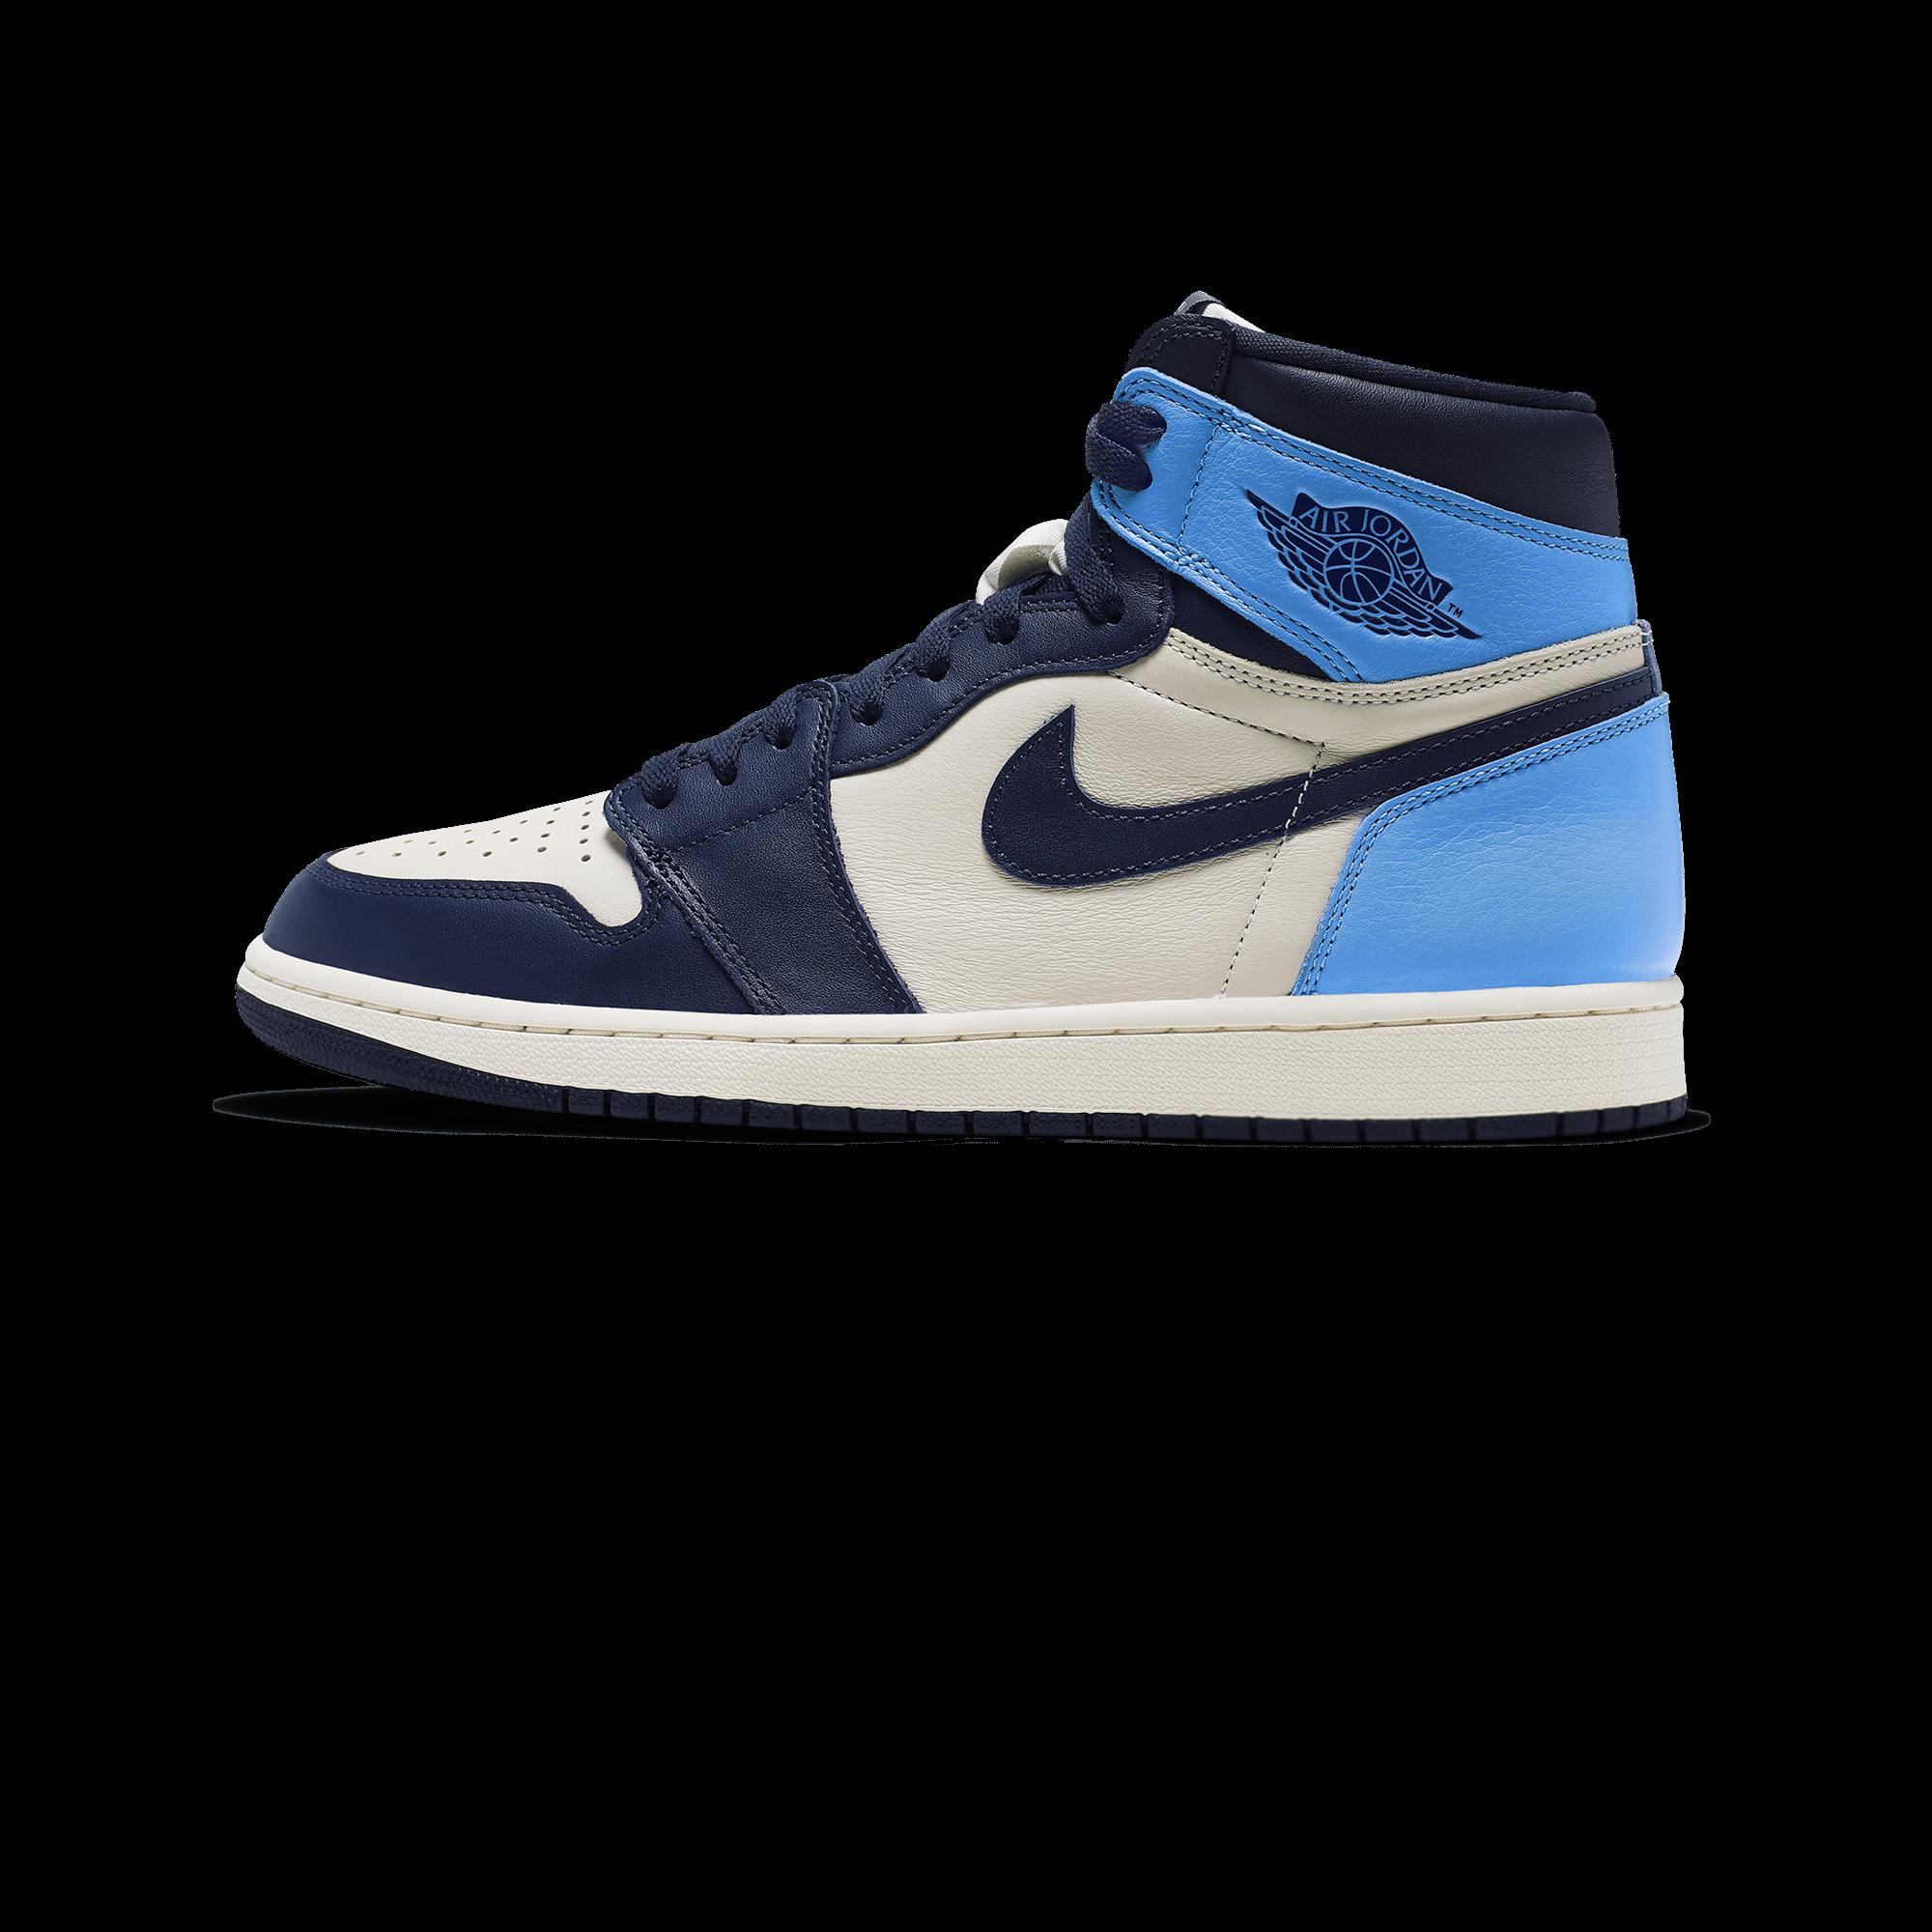 half off 0d284 b04ac Air Jordan Jordan 1 Retro High OG sail / obsidian / university blue - Uomo  | Holypopstore.com